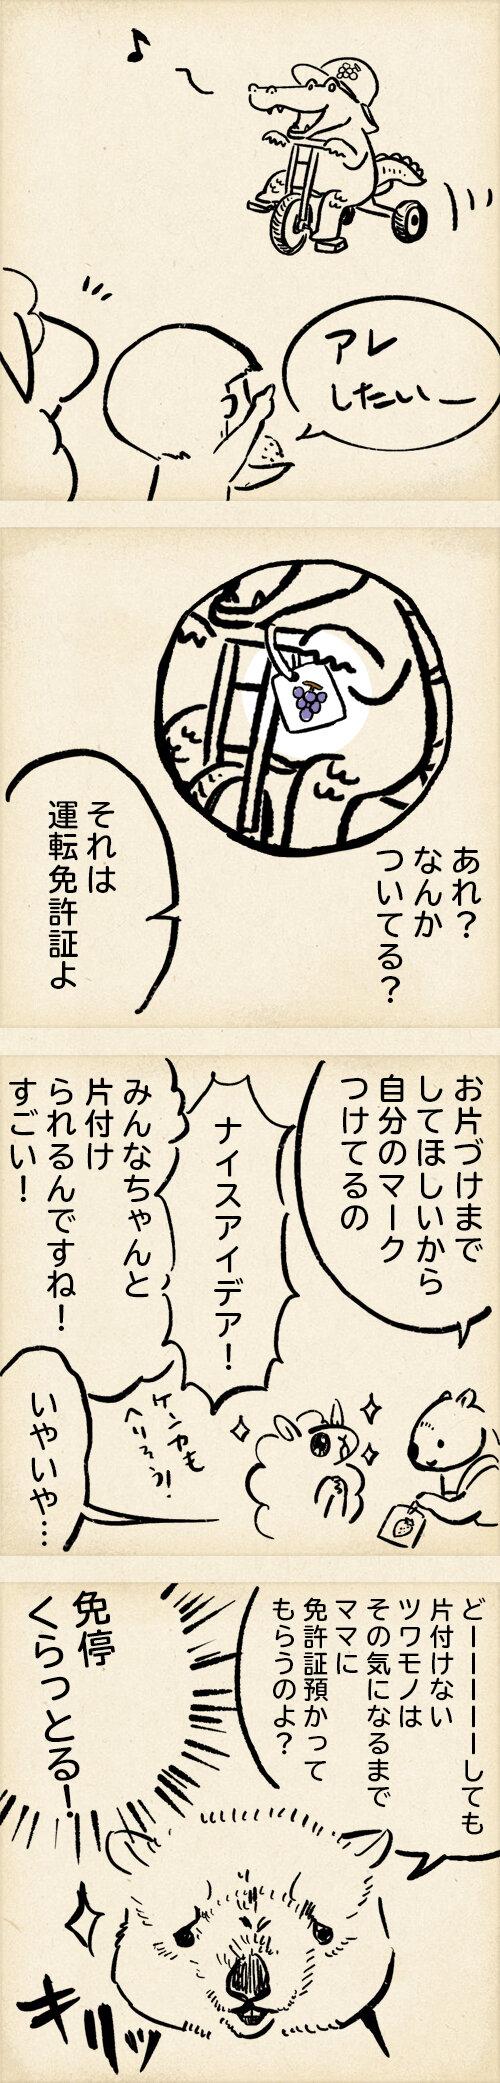 m_1901015_203_2